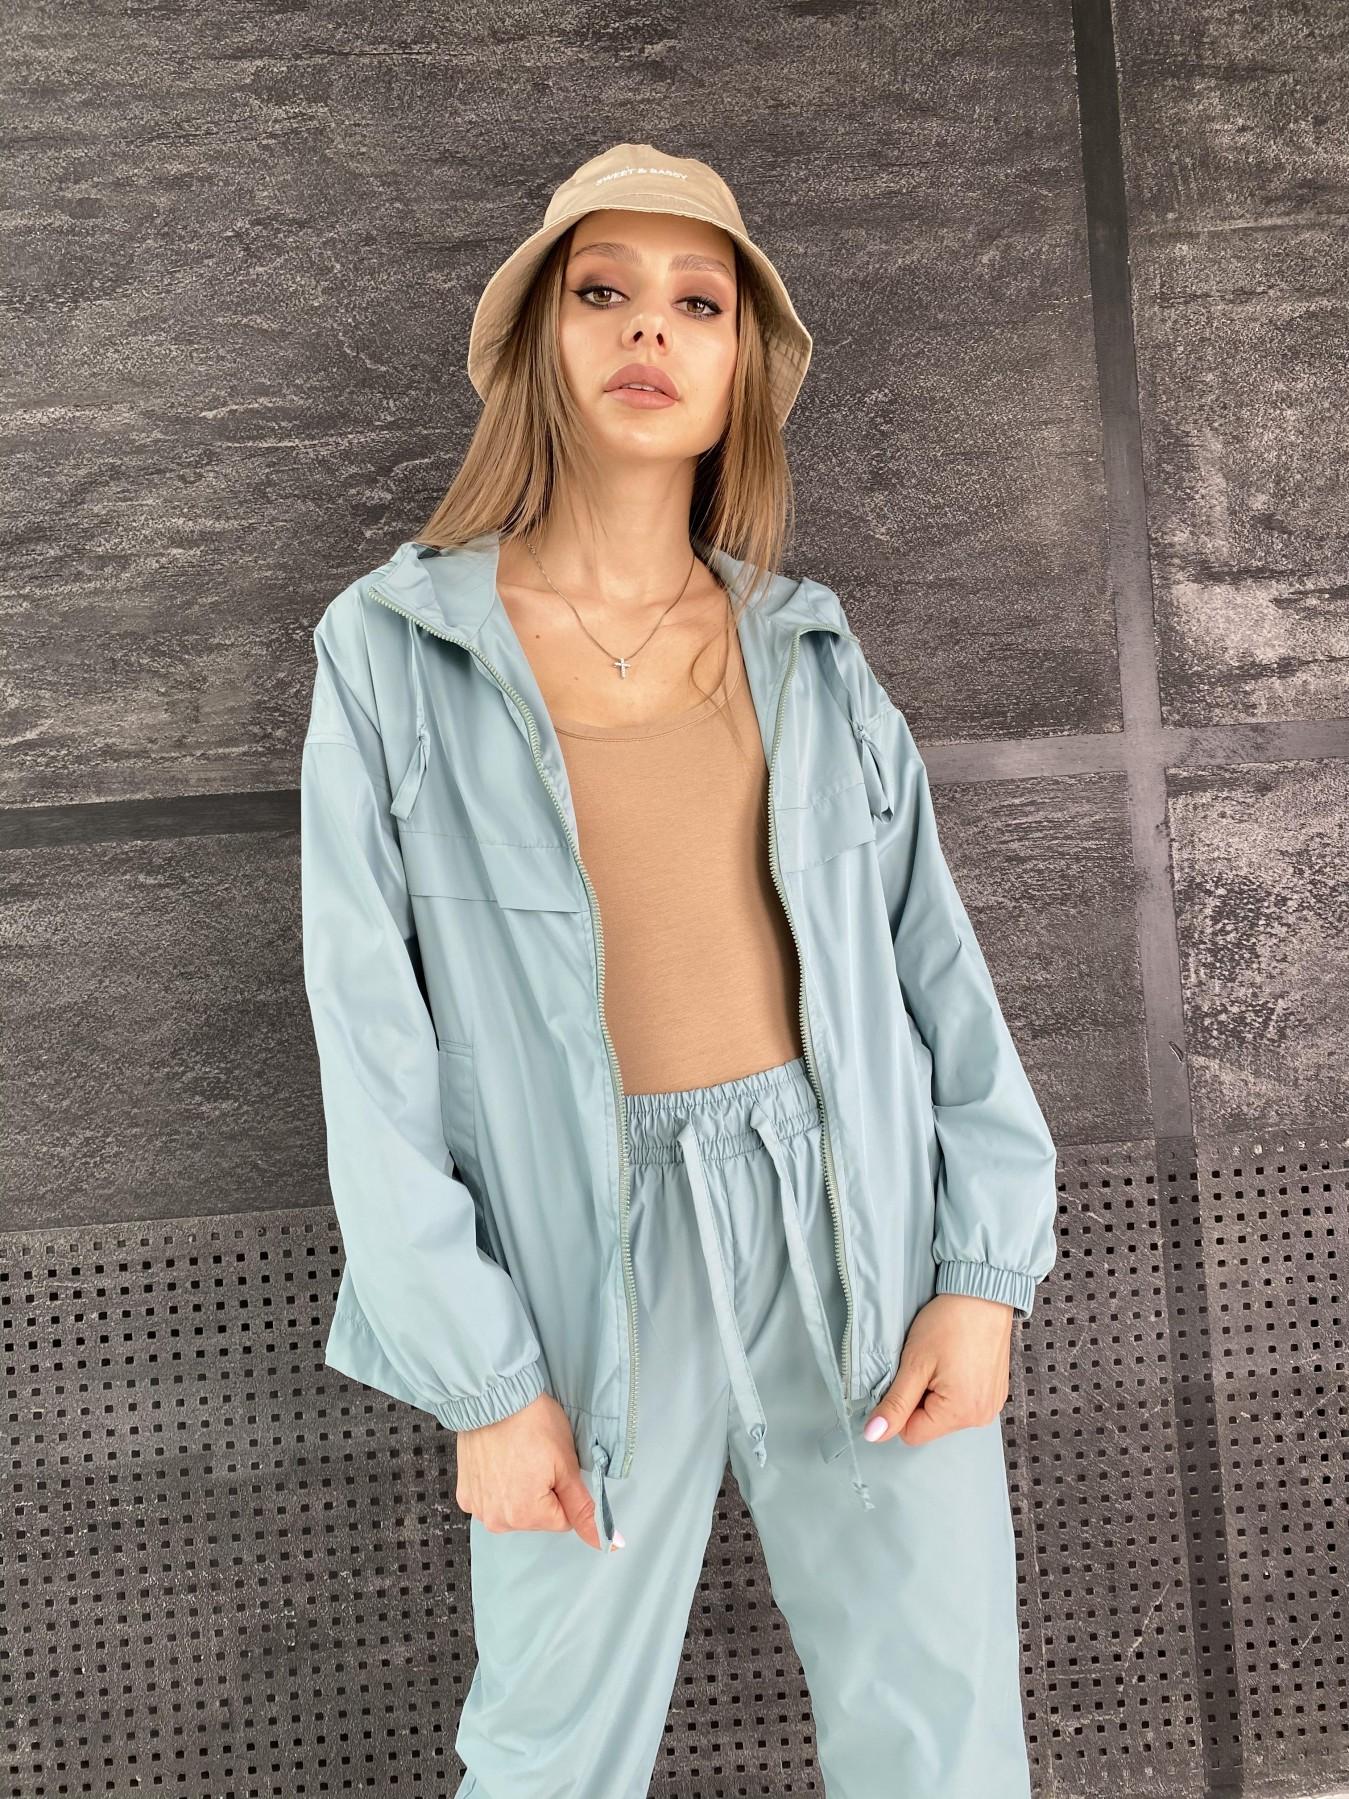 Фит костюм  из плащевой ткани Astra 11052 АРТ. 47536 Цвет: Олива - фото 5, интернет магазин tm-modus.ru